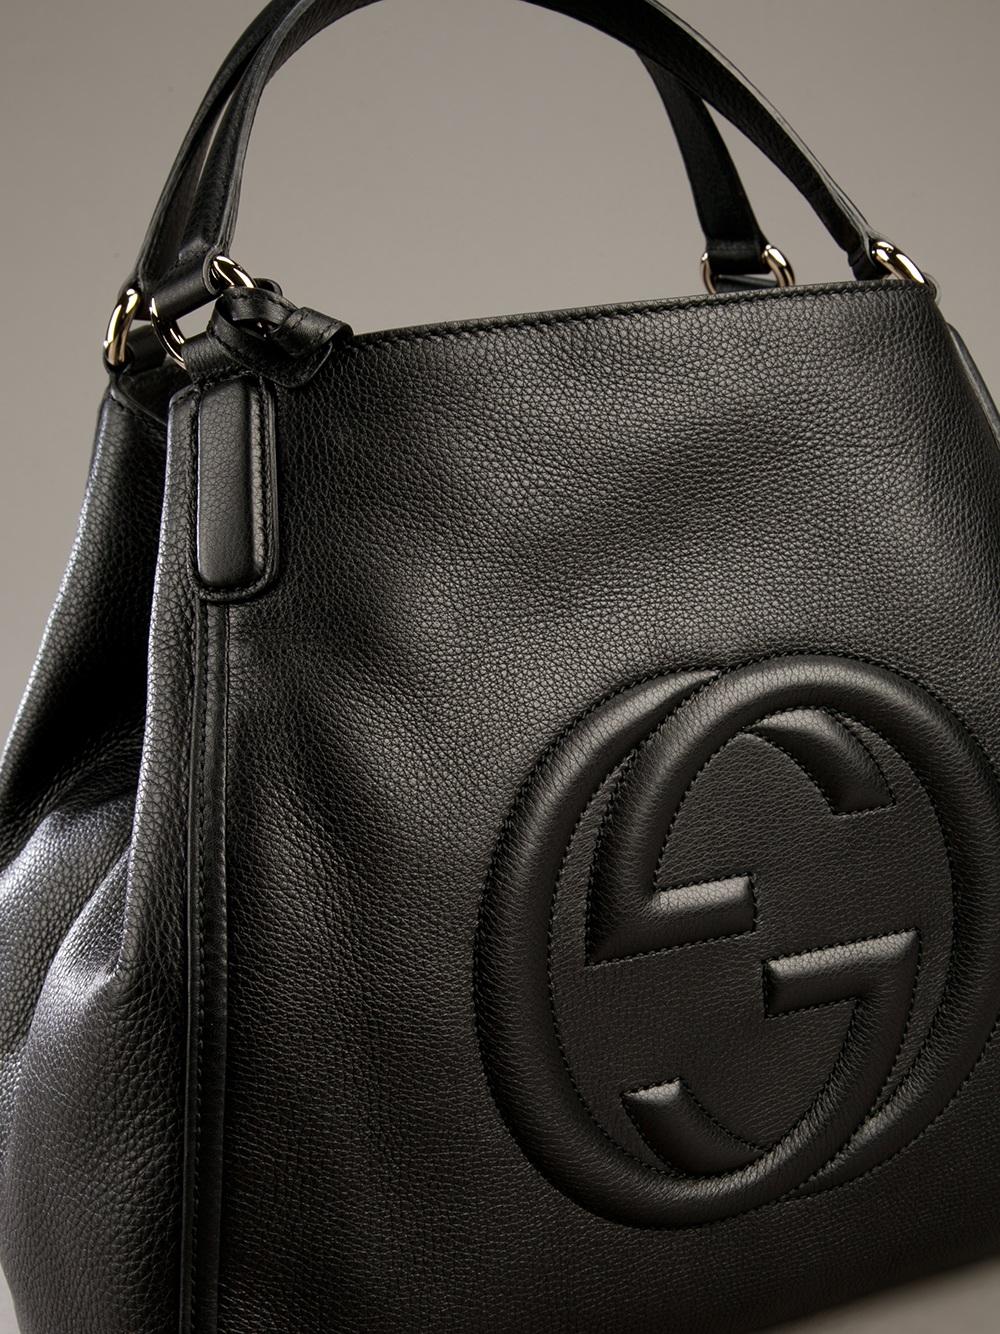 Gucci Soho Tote Bag In Black Lyst